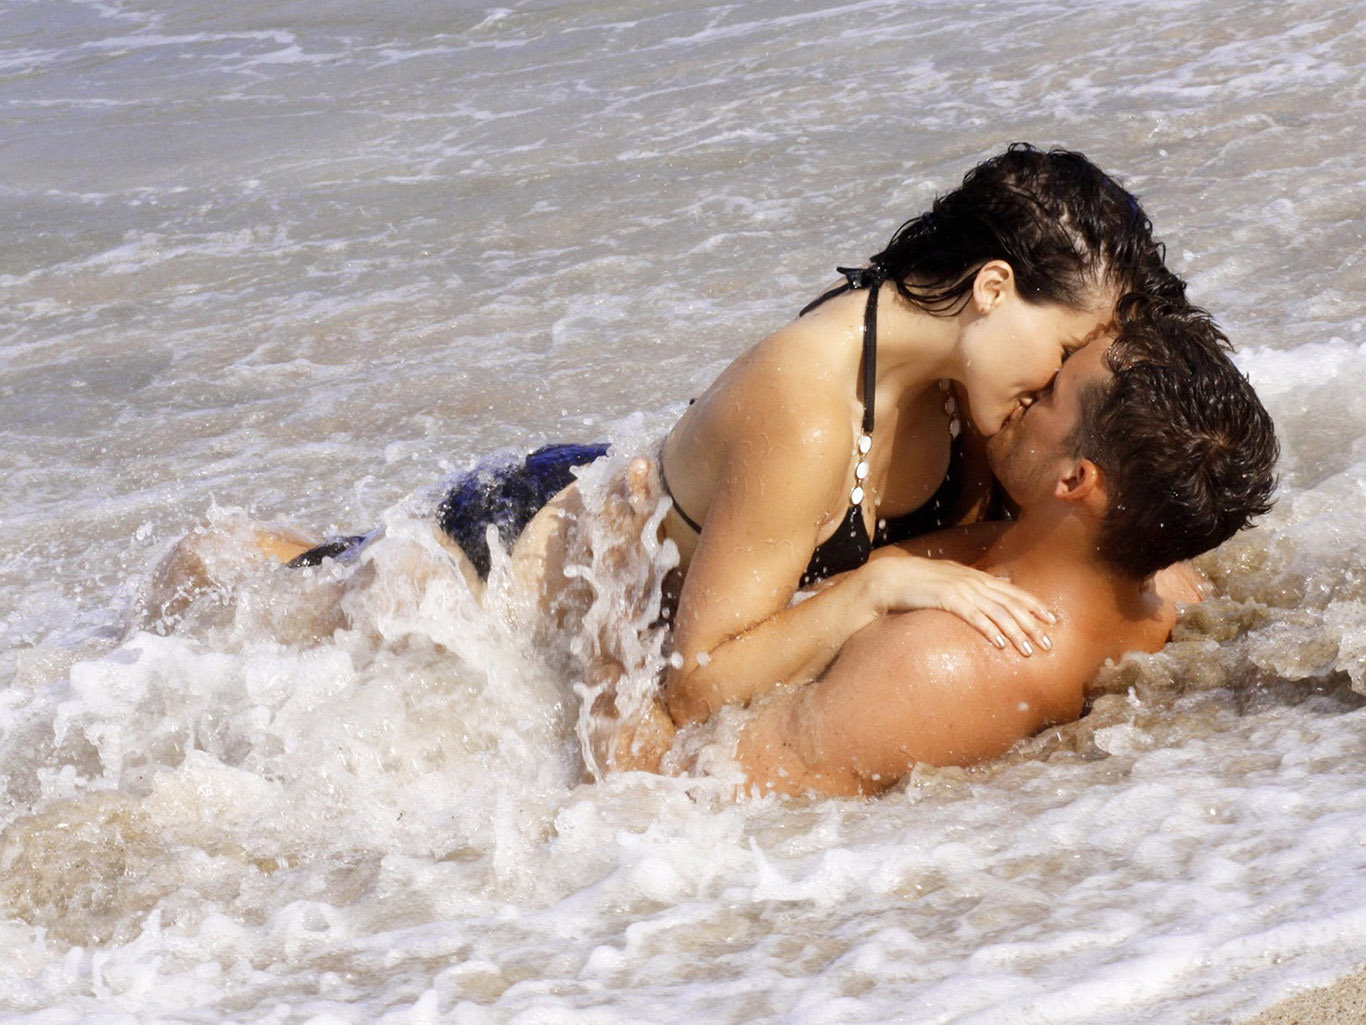 Секс видео на природе и на пляже